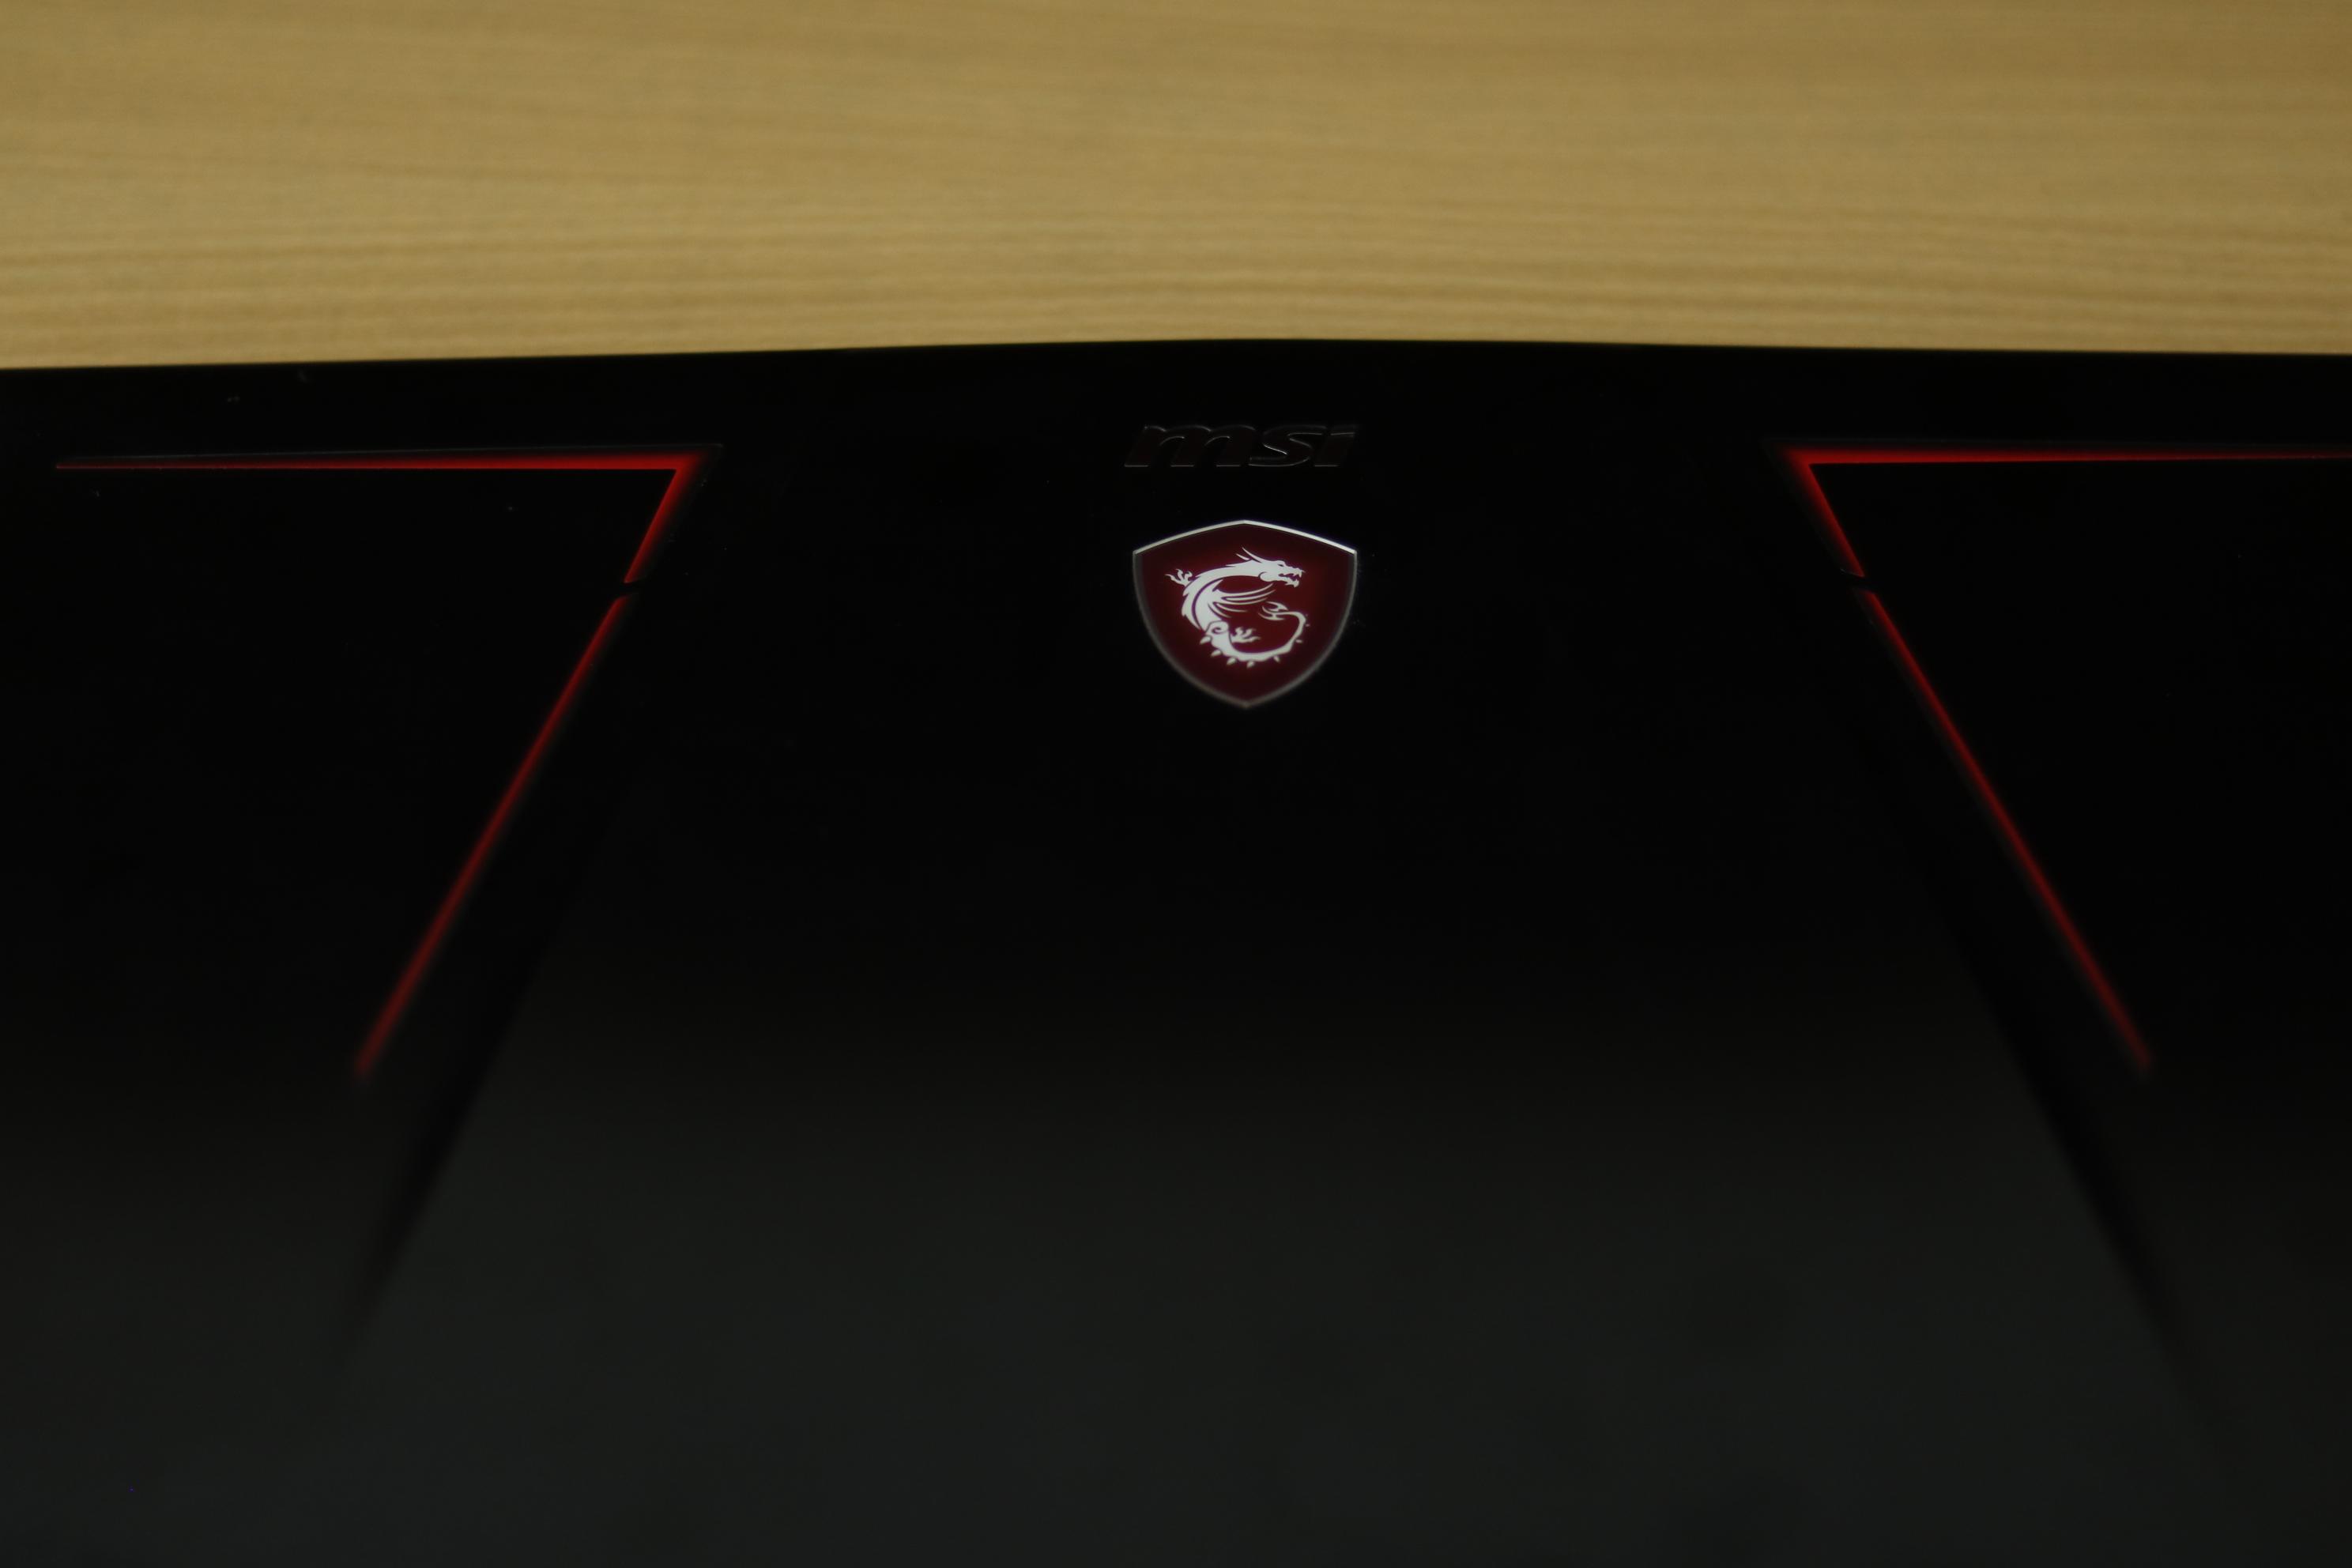 Review: MSI GE73VR 7RF Raider Gaming Laptop - Gaming Central